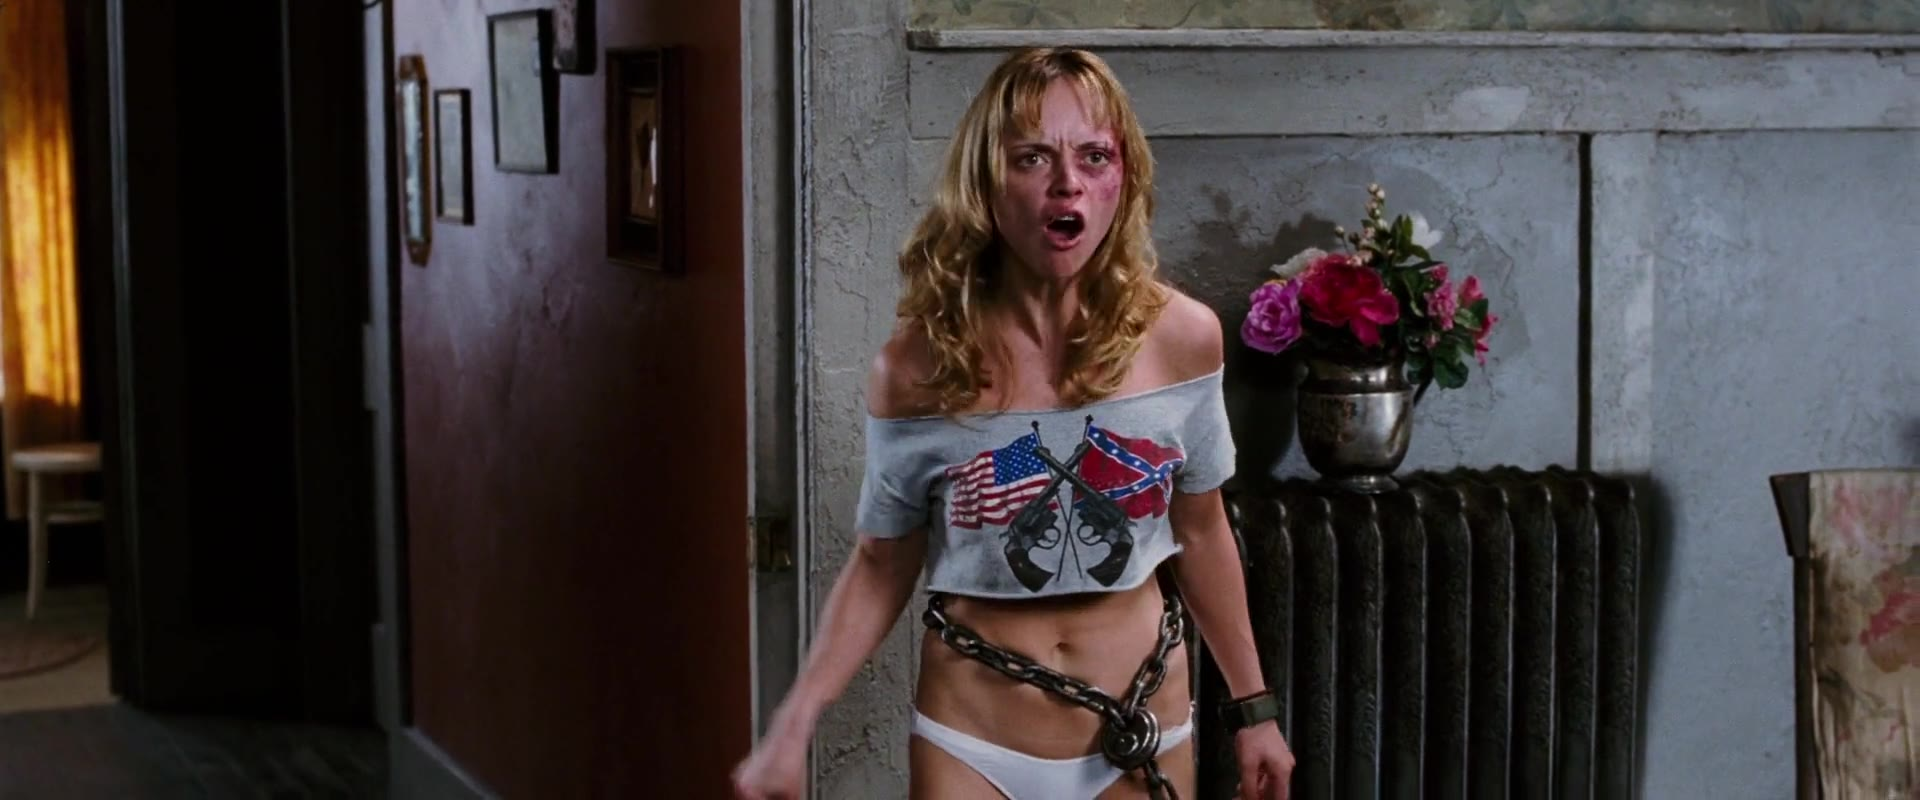 Christina Ricci sexy scene - Black Snake Moan